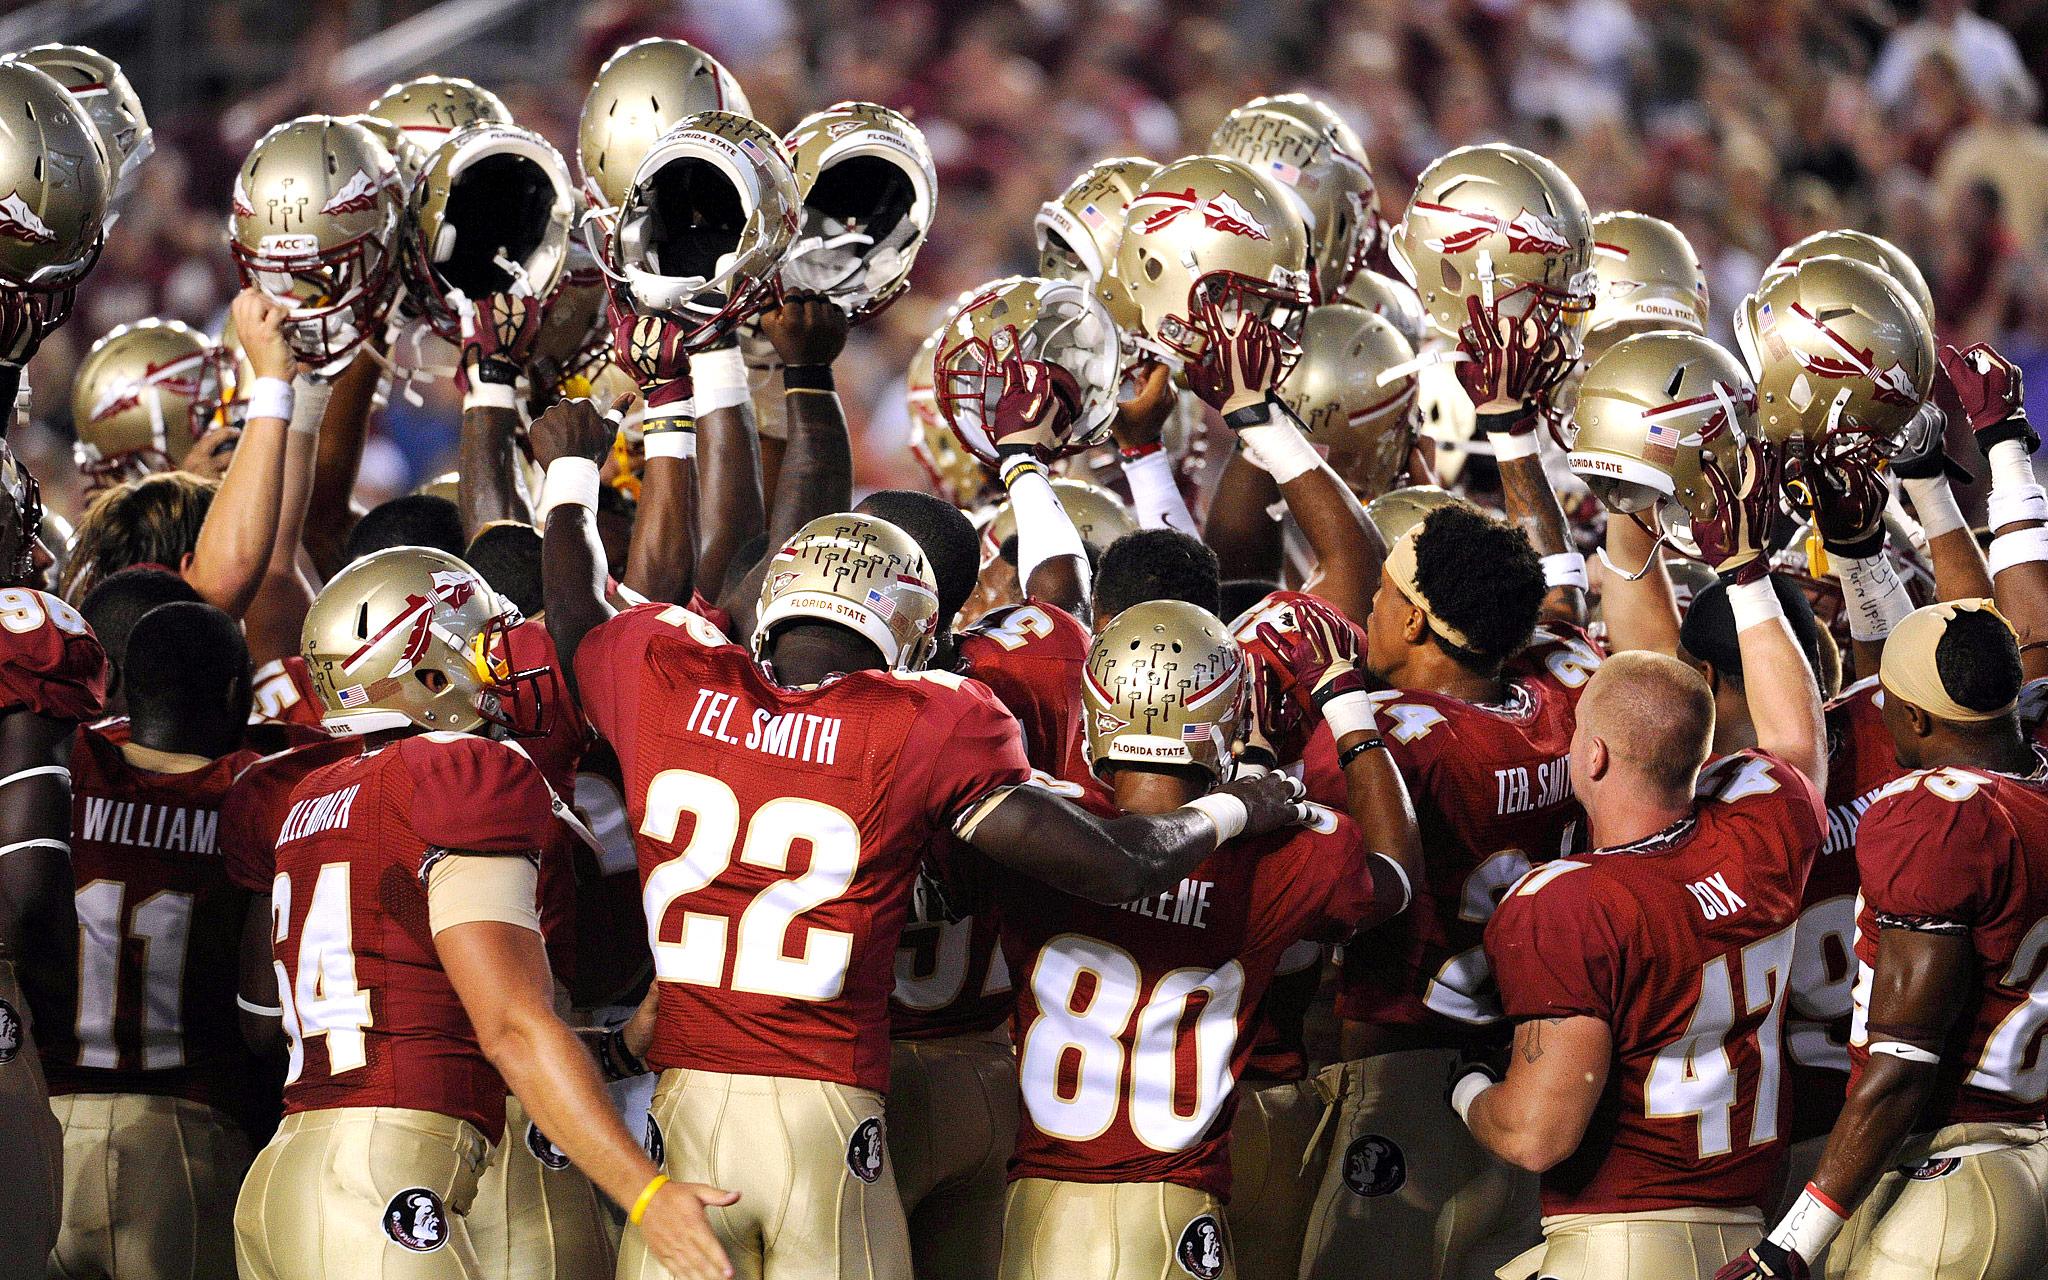 Forida state seminoles college football 24 wallpaper 2048x1280 forida state seminoles college football 24 wallpaper 2048x1280 210944 wallpaperup voltagebd Choice Image